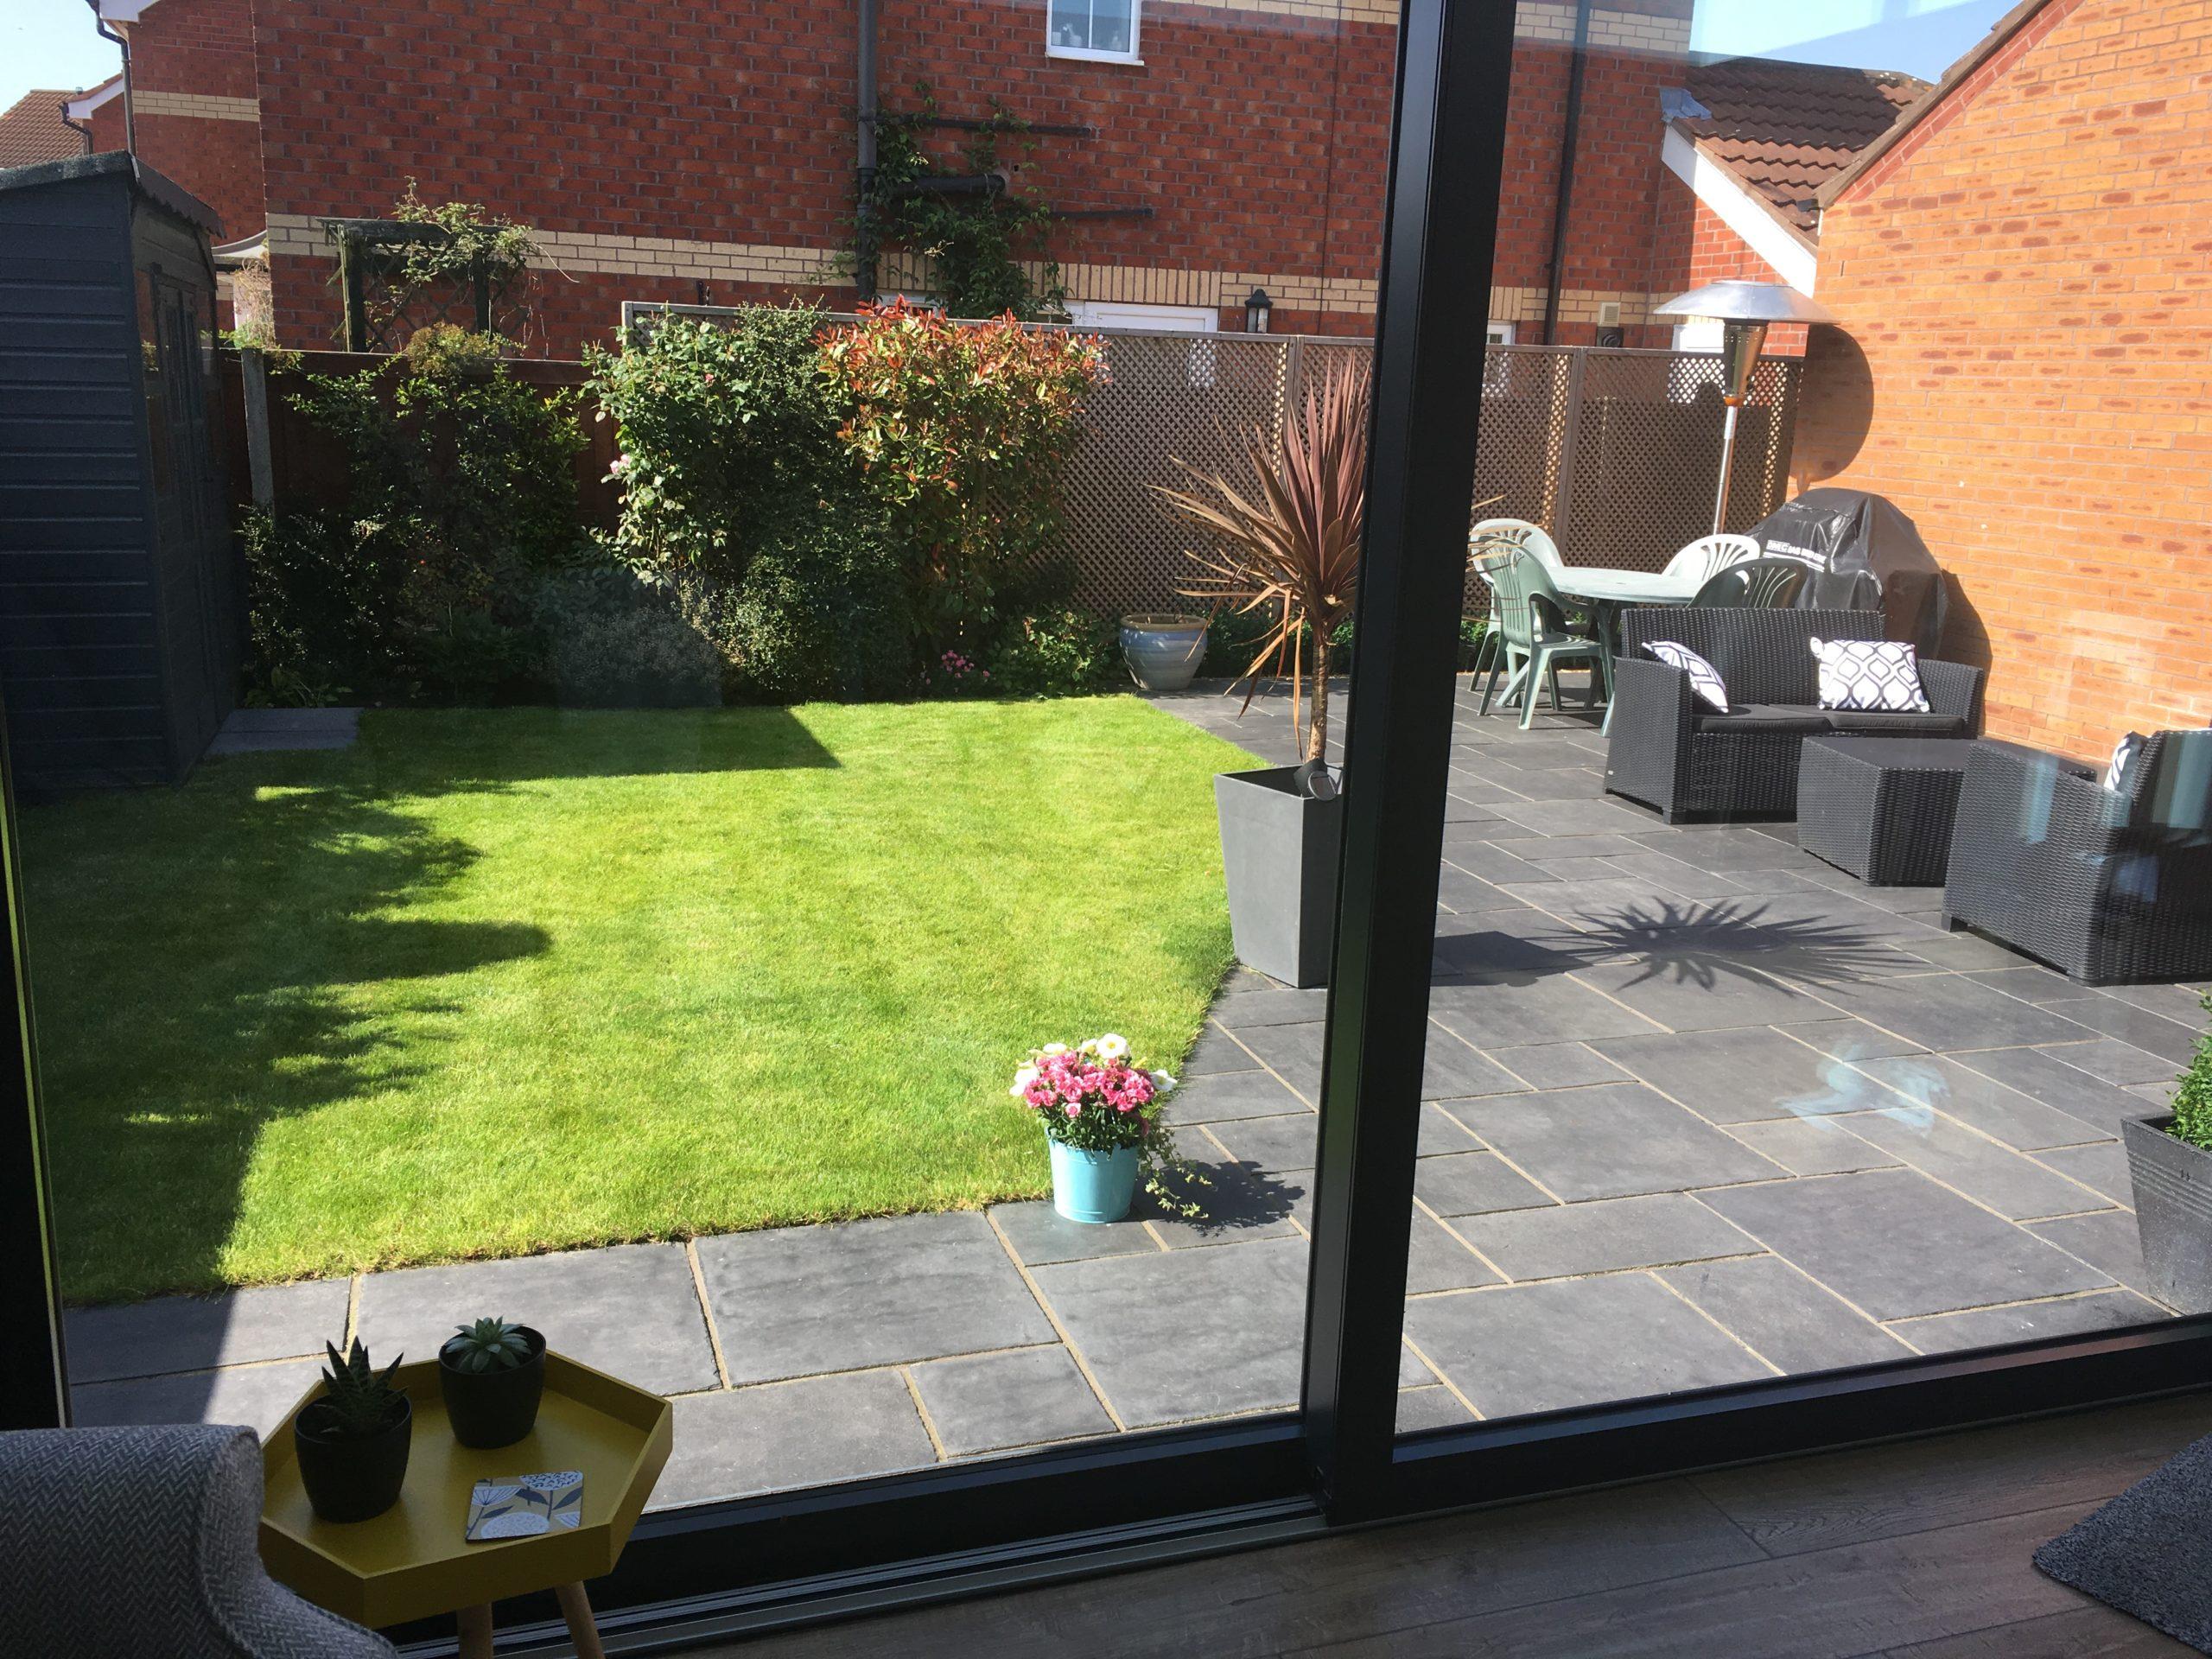 Garden view form inside single storey extension